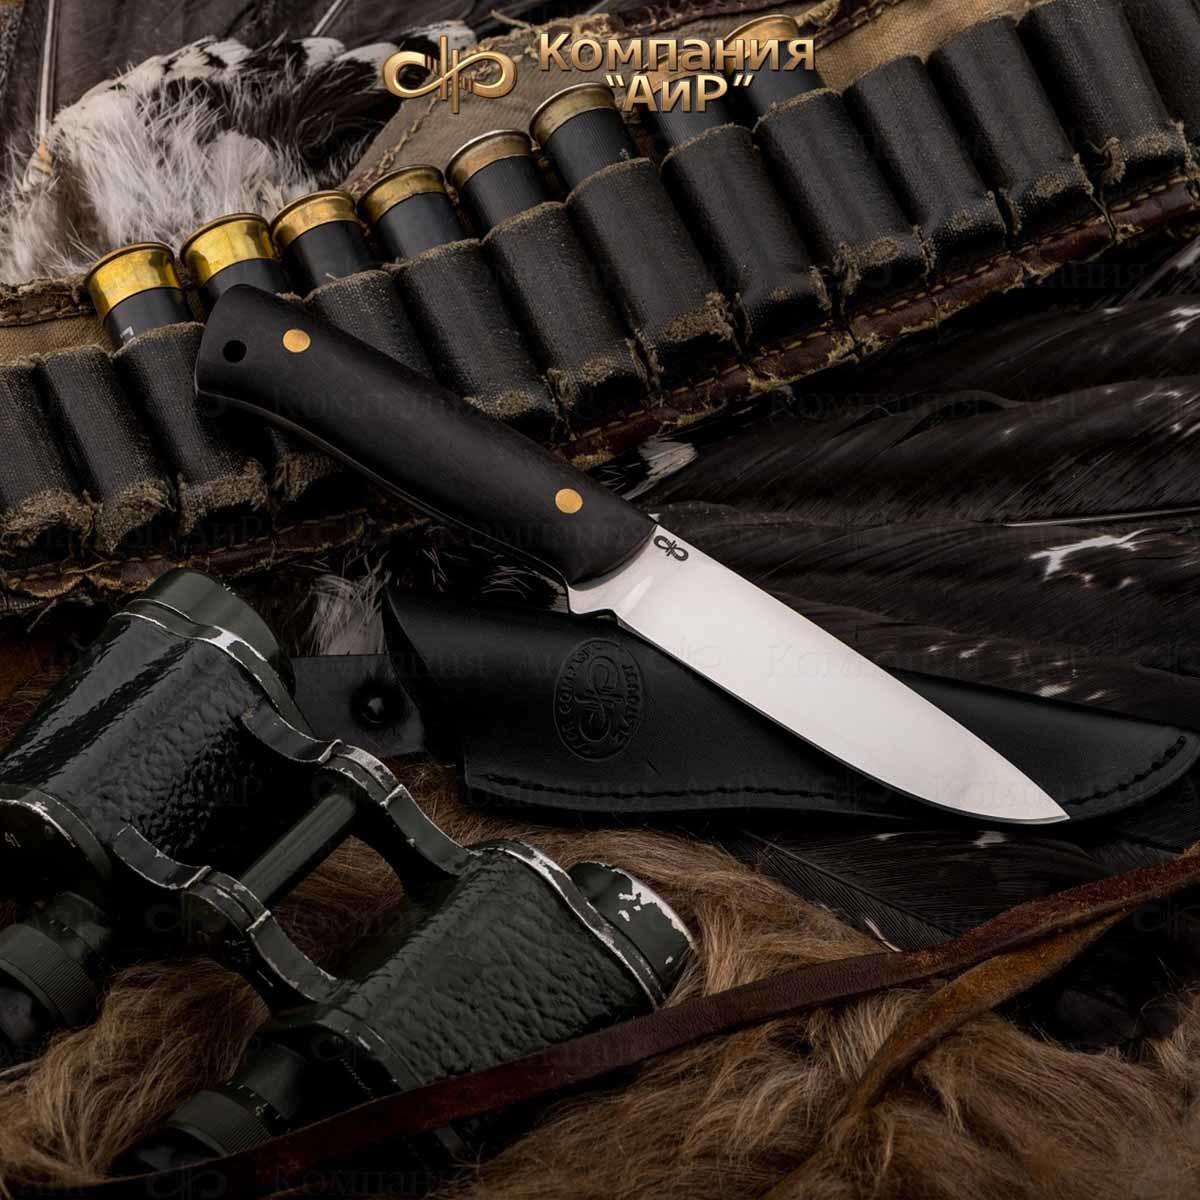 Нож разделочный АиР Стриж ЦМ, сталь М390, рукоять граб нож разделочный стриж цм дерево 100х13м аир